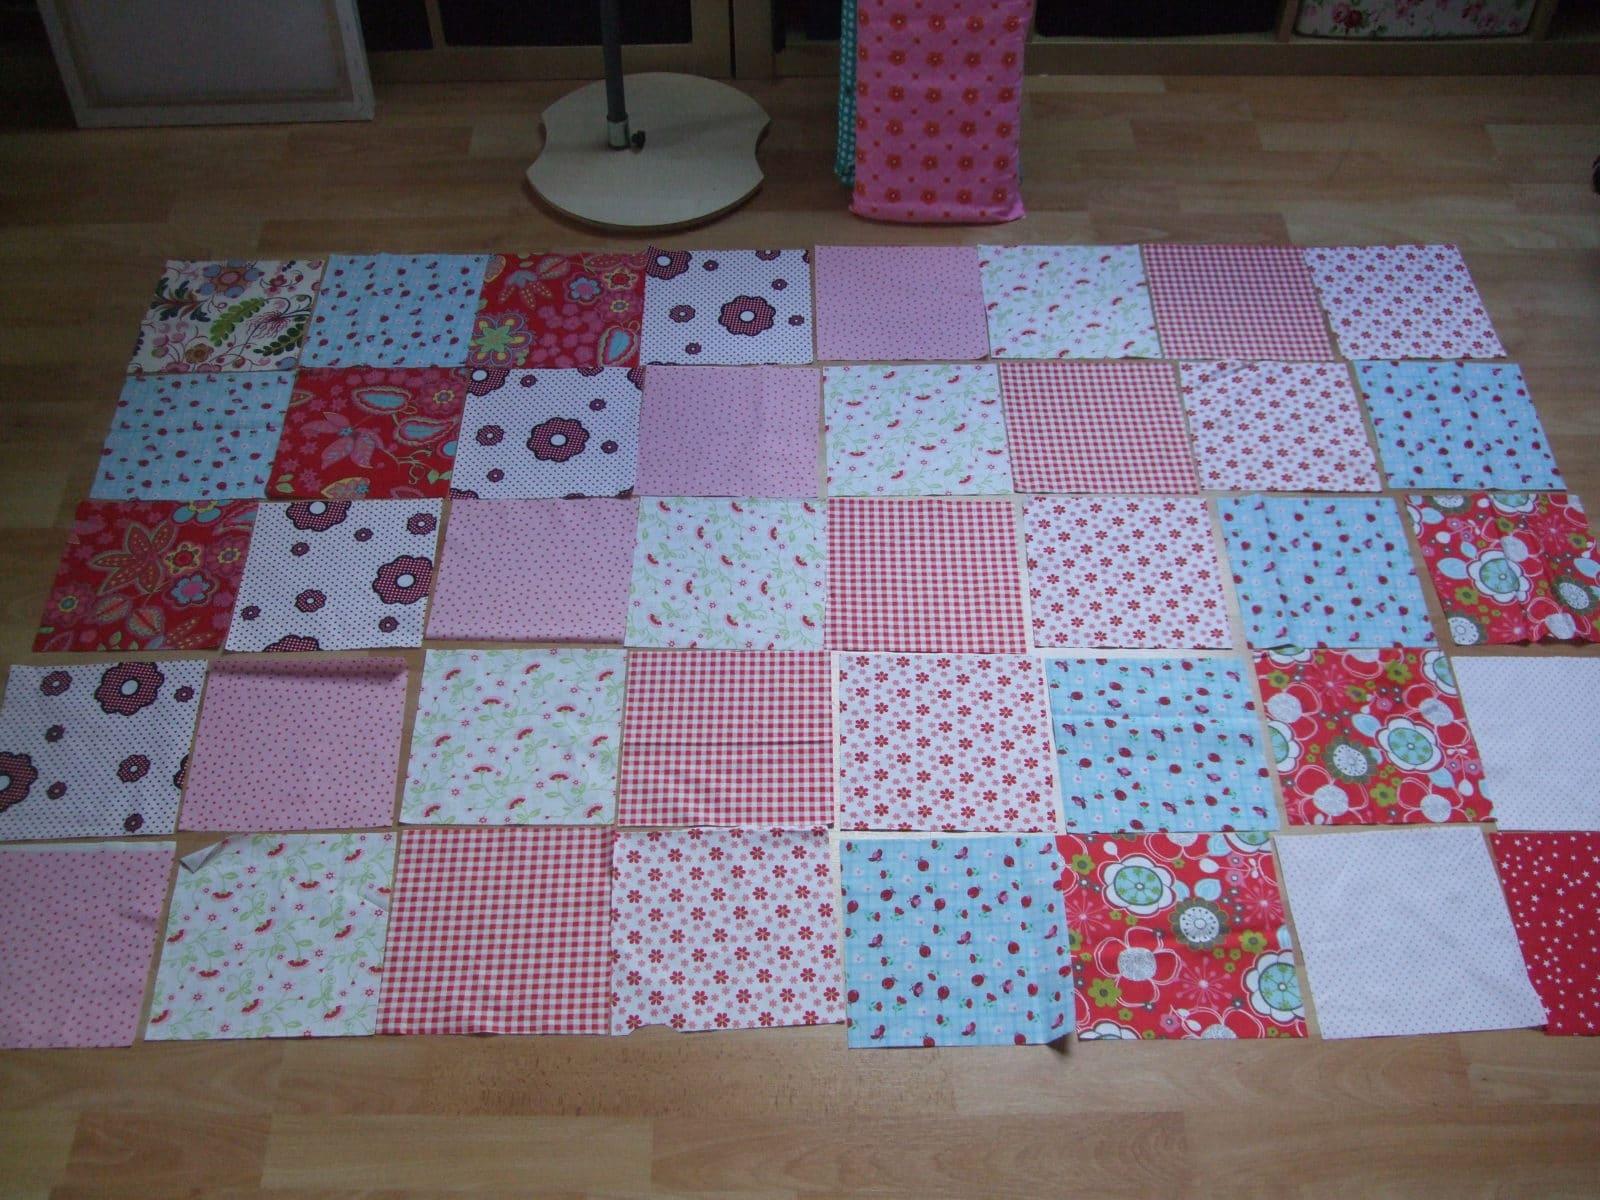 quadrate patchwork decke häkeln